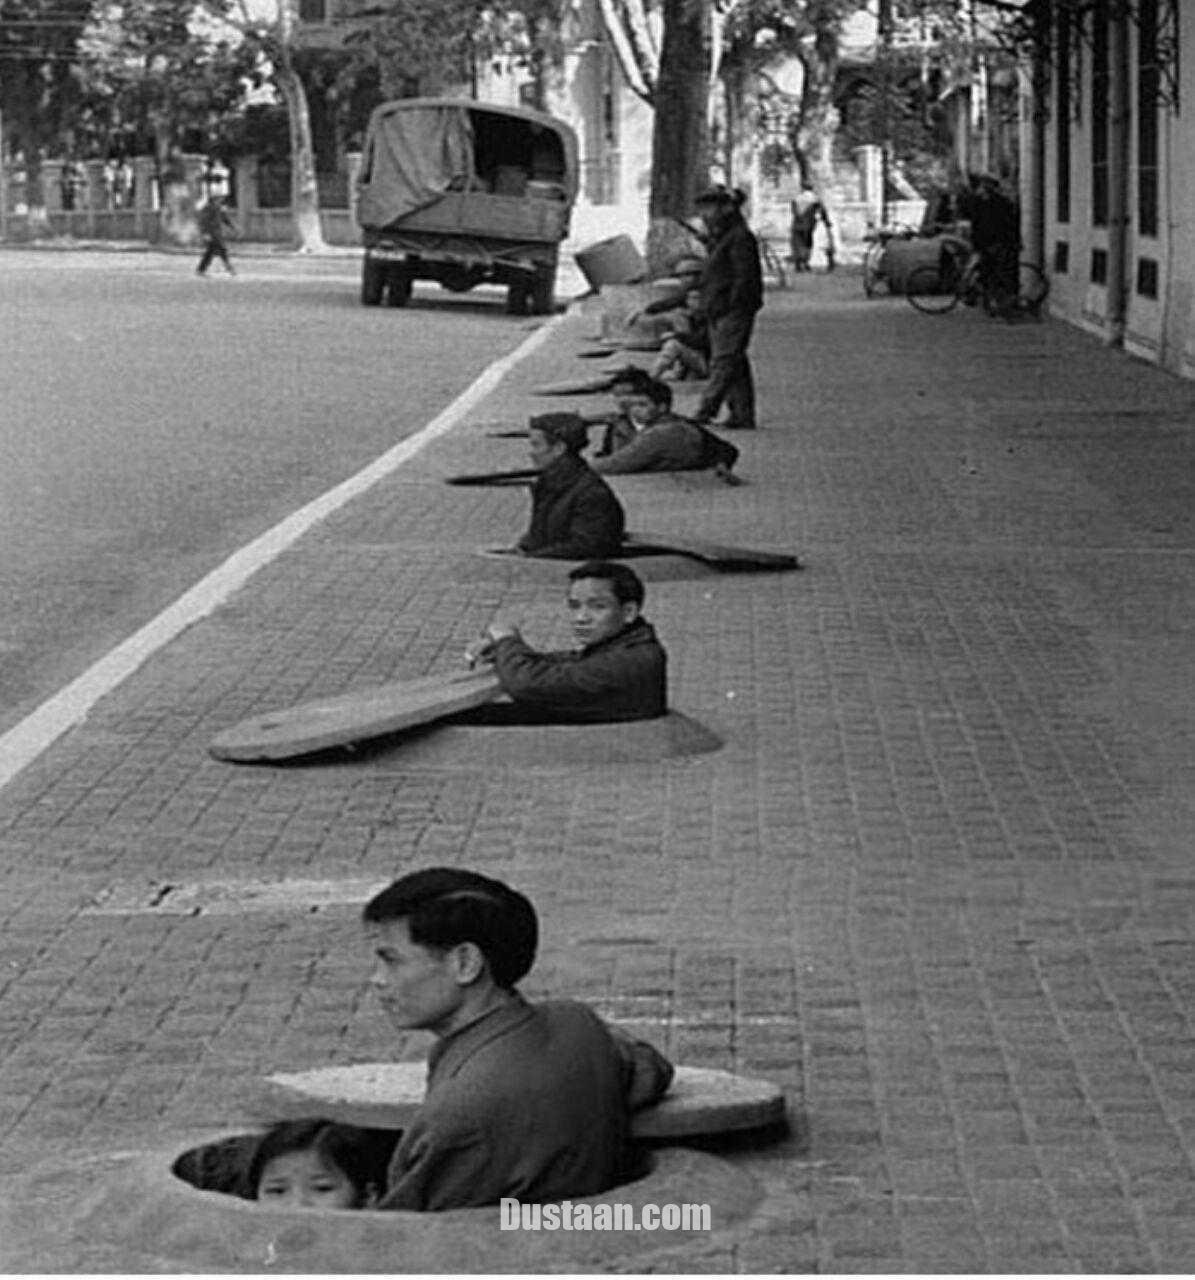 www.dustaan.com تصویری از نحوه پناه گرفتن مردم ویتنام در زمان حمله آمریکا